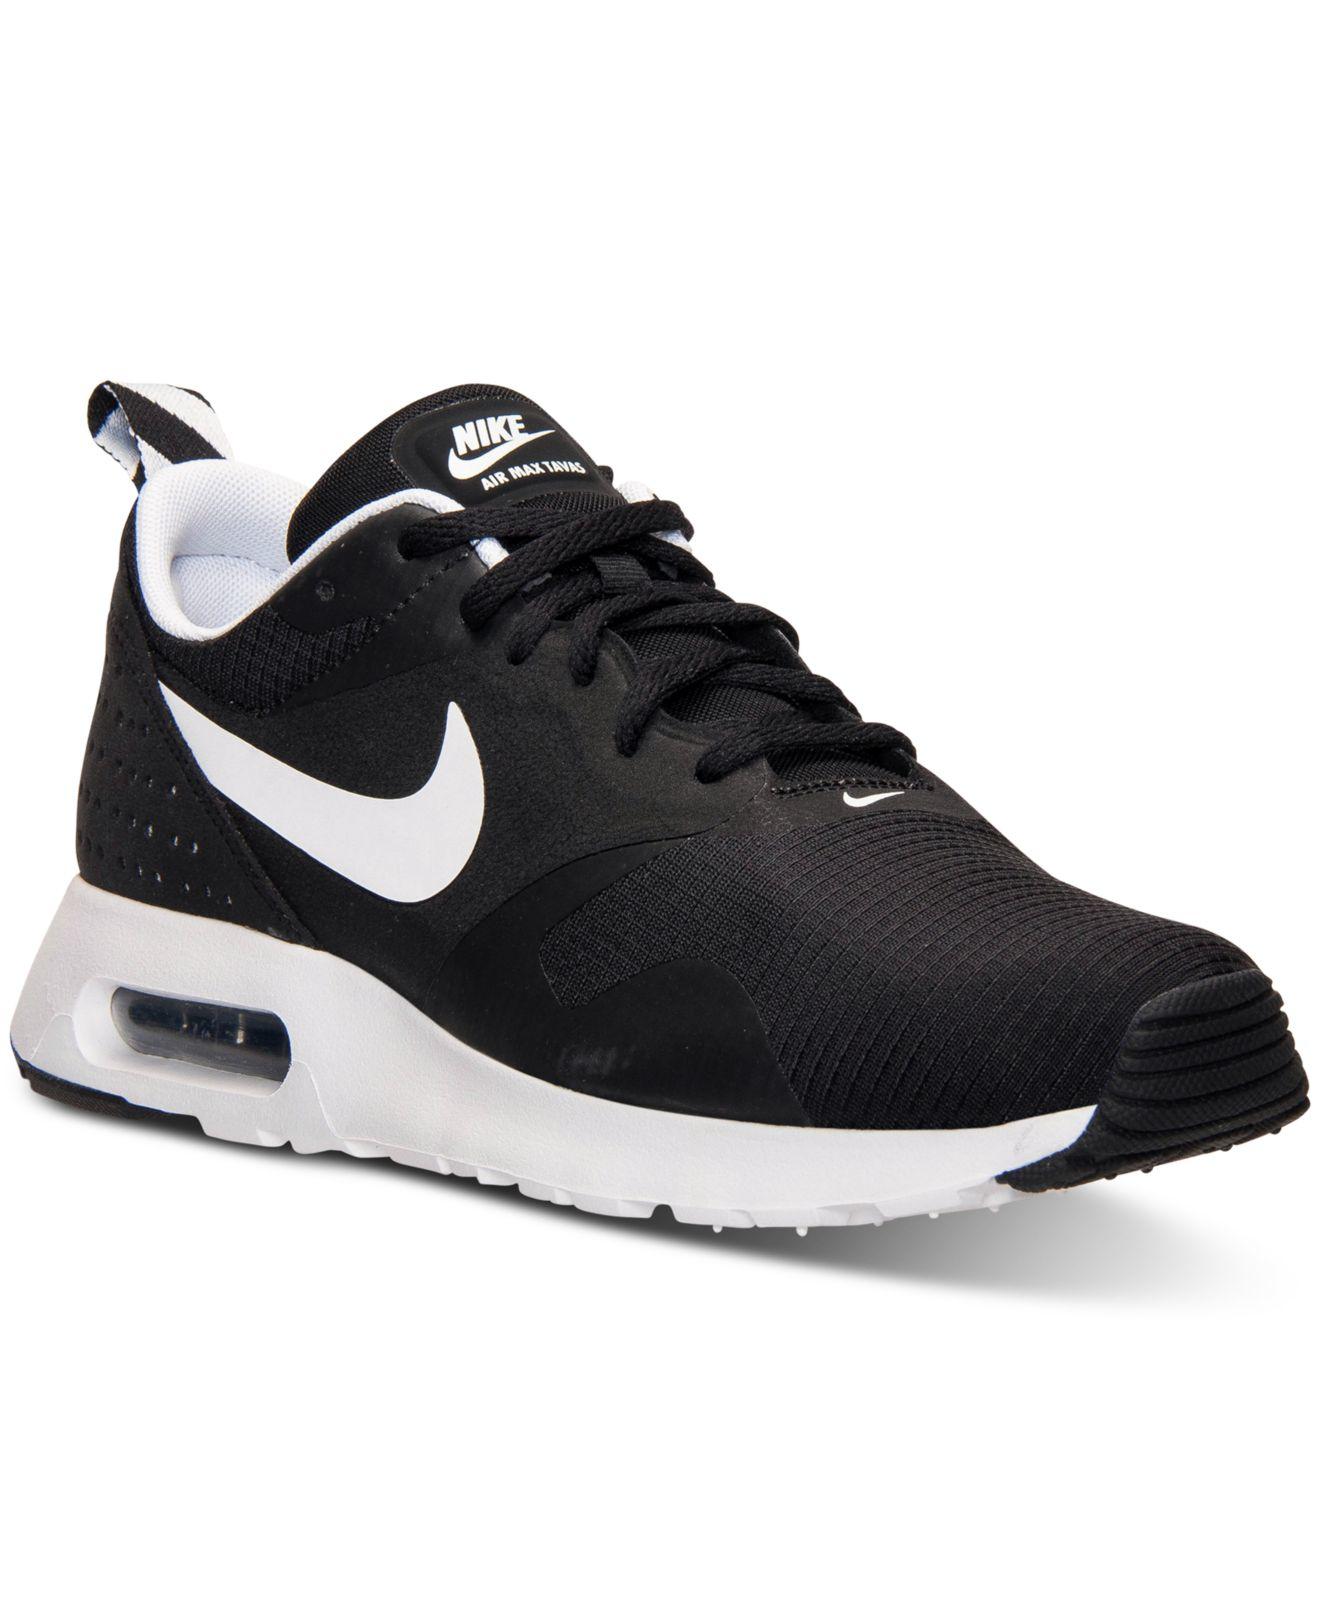 2503af500 nike-blackwhiteblack-mens-air-max-tavas-running-sneakers -from-finish-line-black-product-2-047003461-normal.jpeg